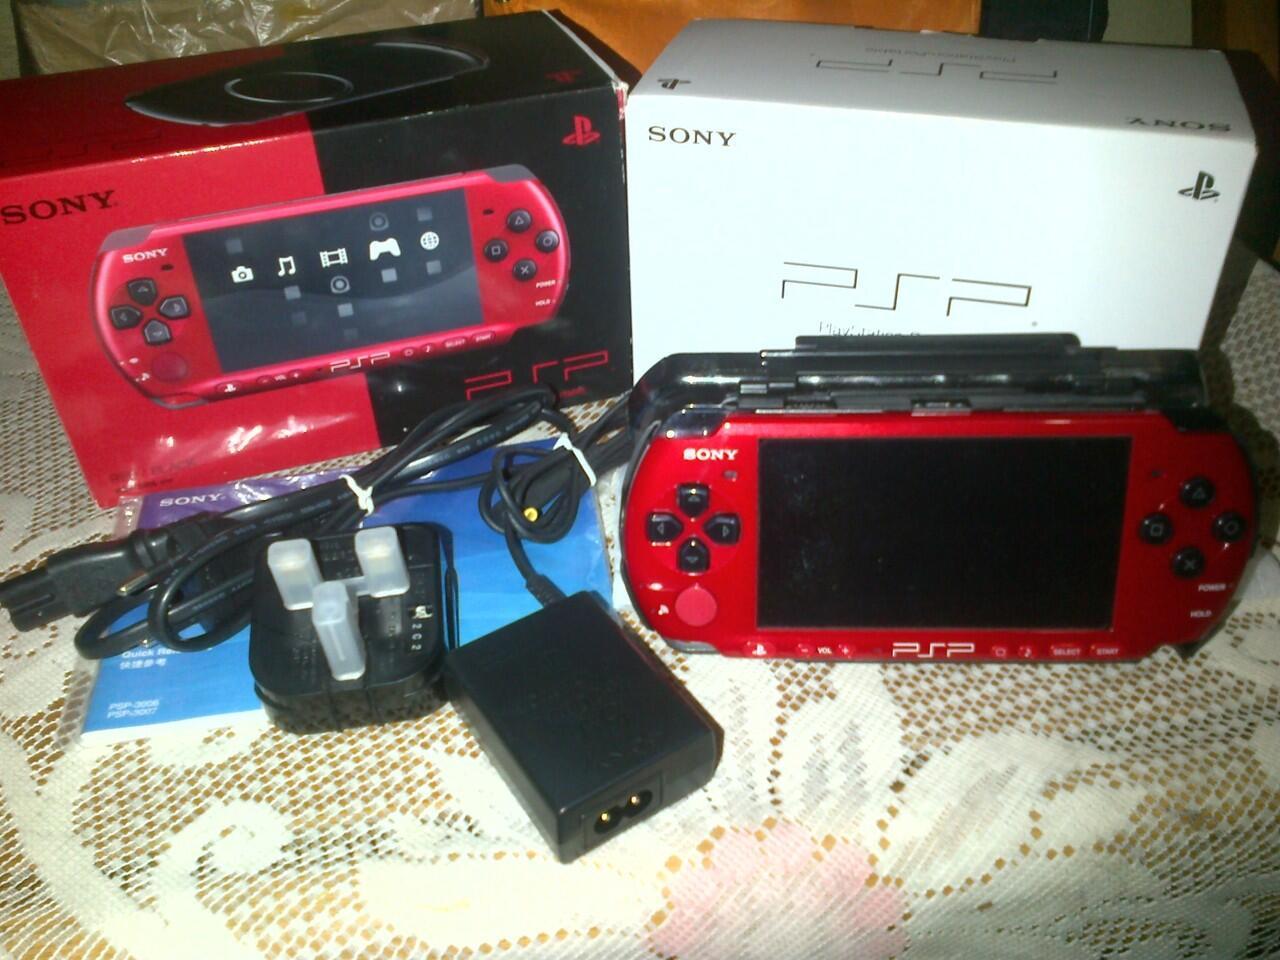 PSP 3006 XRB 16gyga Like new